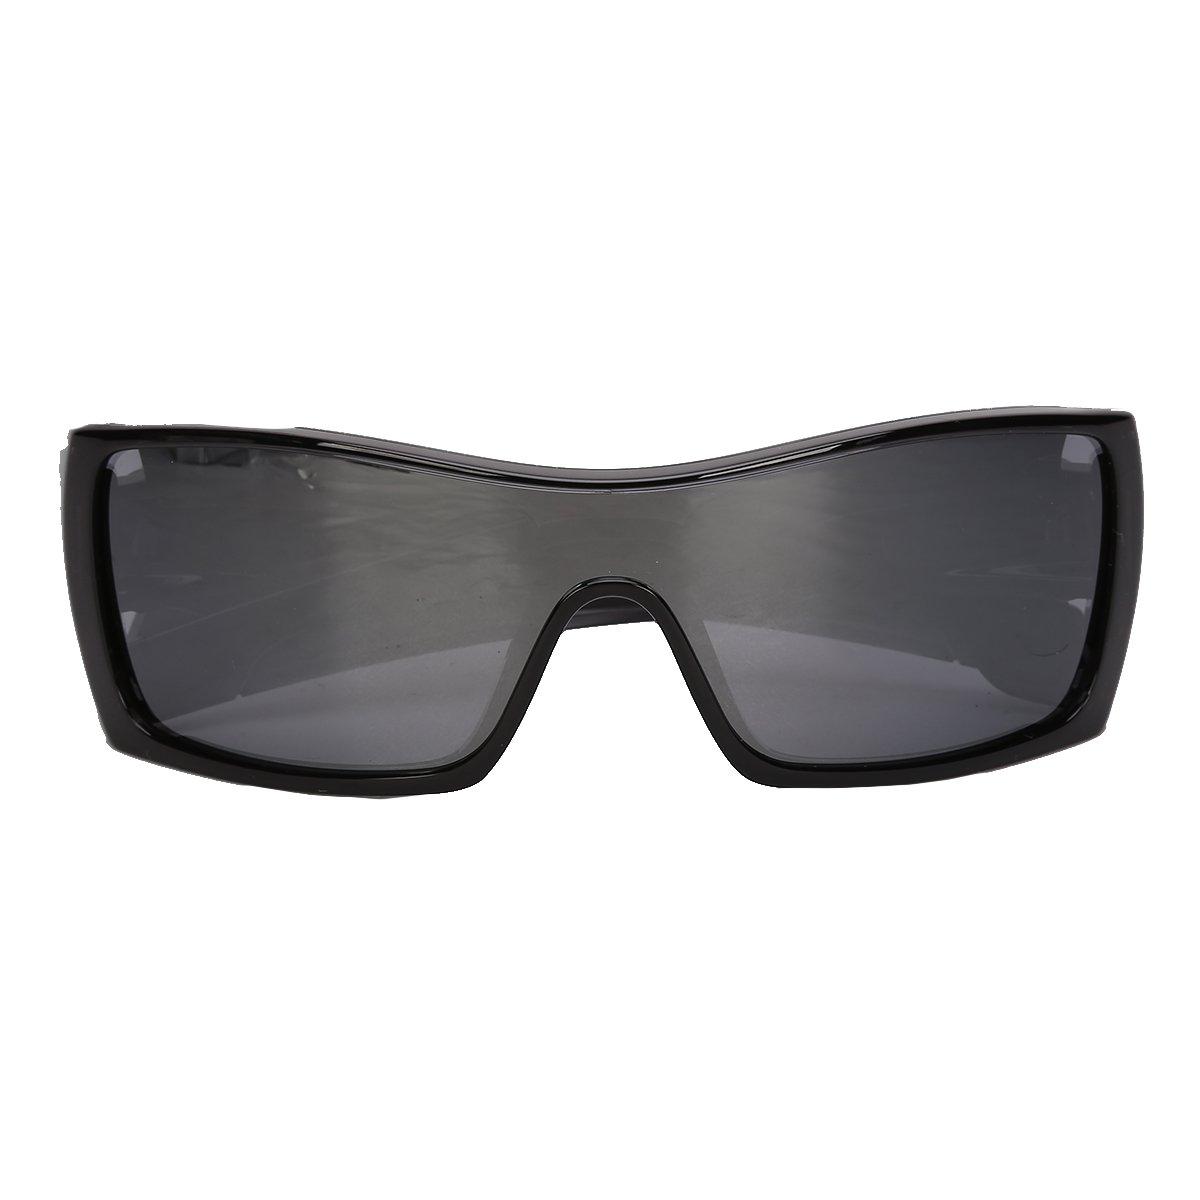 11bcd618854c2 Óculos Oakley Batwolf - Iridium - Preto